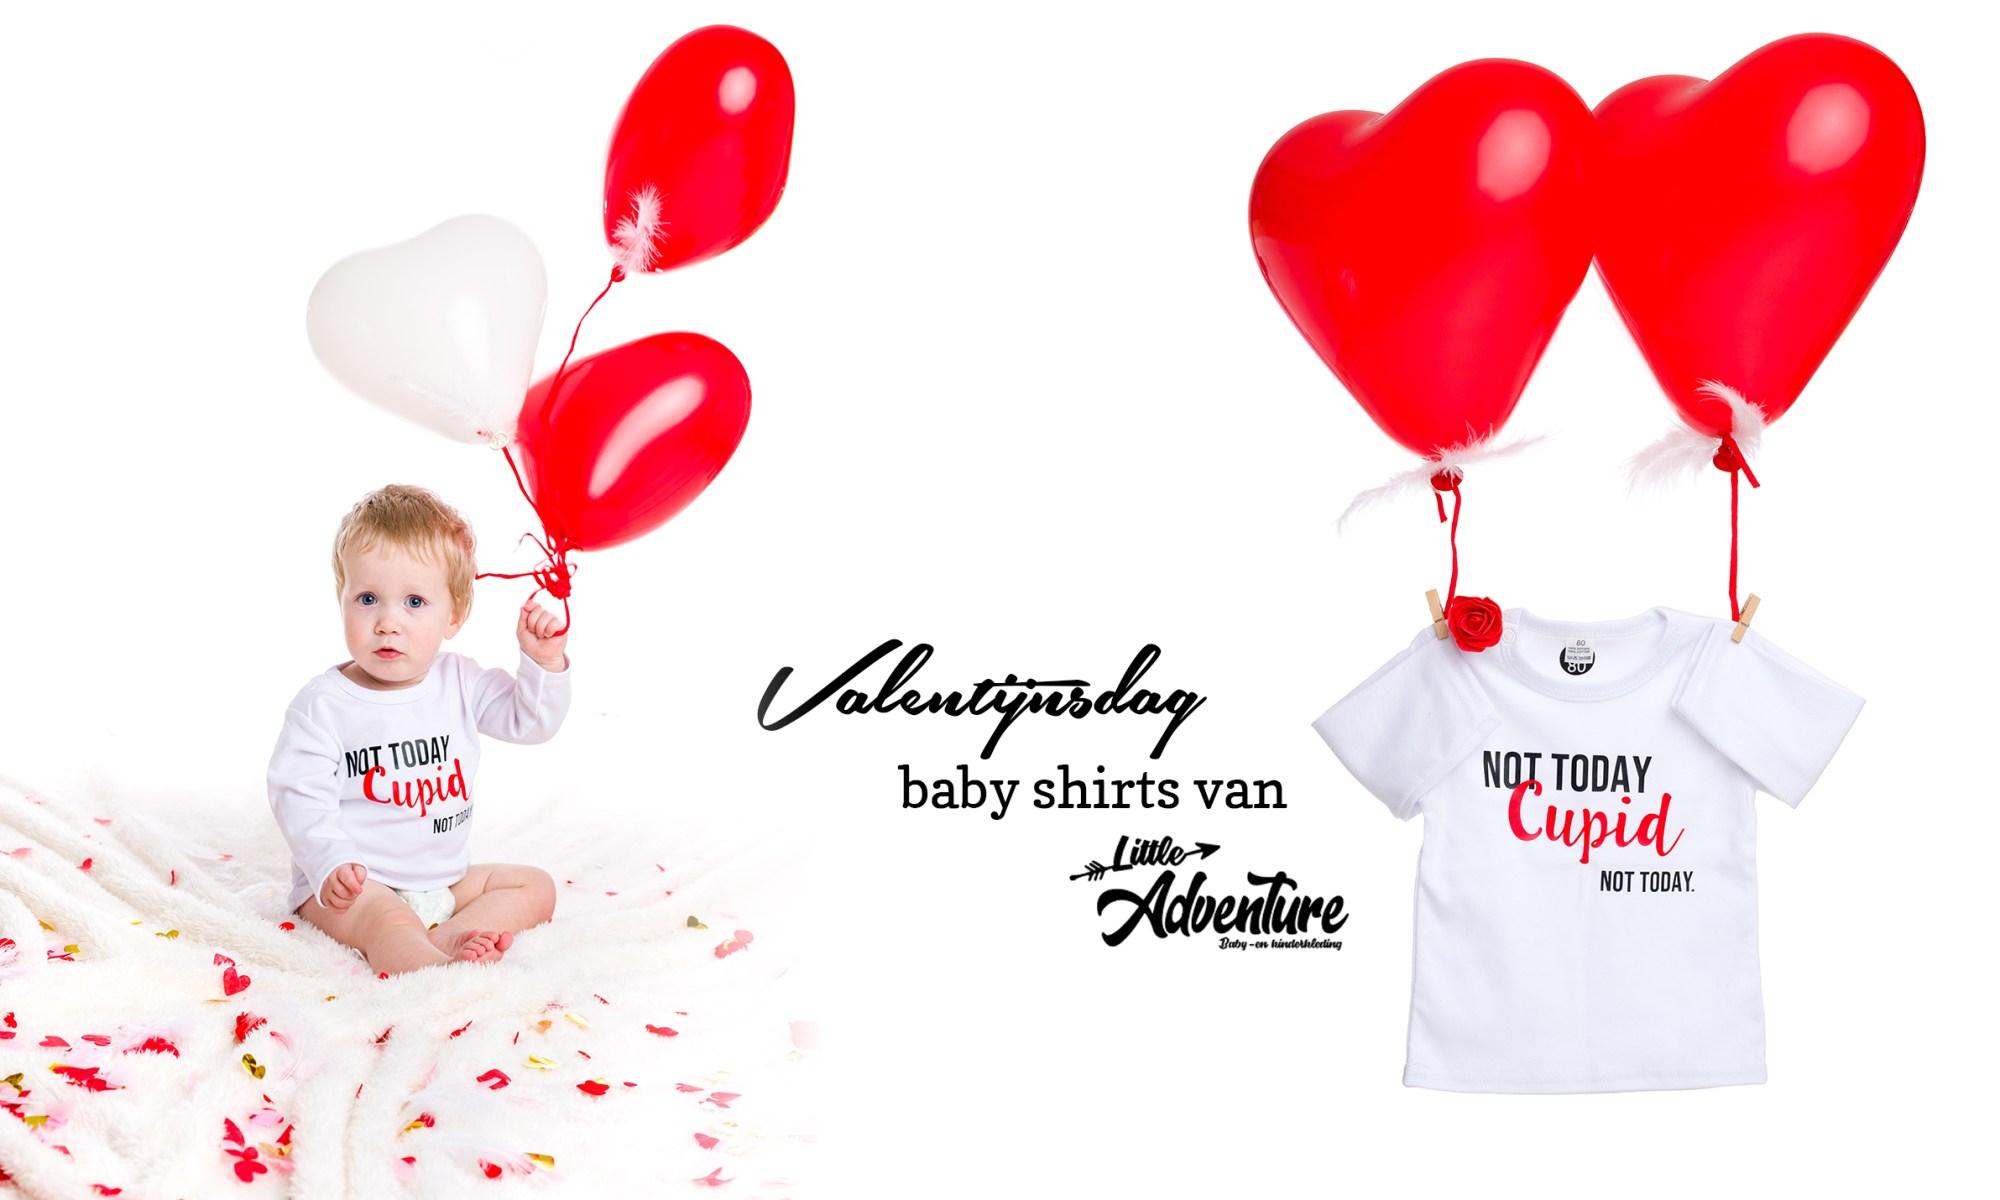 Valentijnsdag baby shirt little adventure mama blog fotograaf brandrep www.liefkleinwonder.nl review babykleding kinderkelding peuter baby